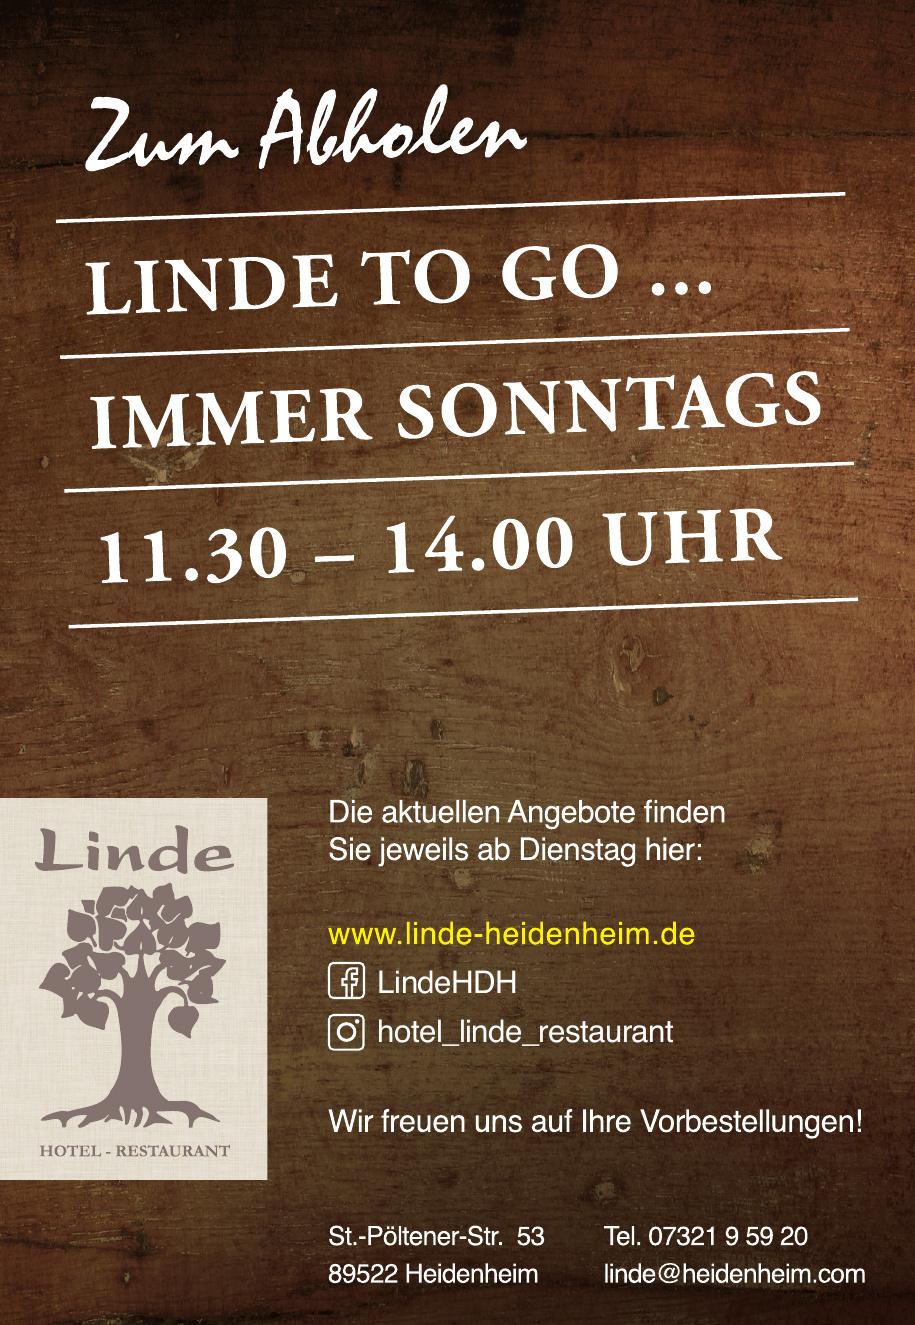 Linde Hotel, Restaurant